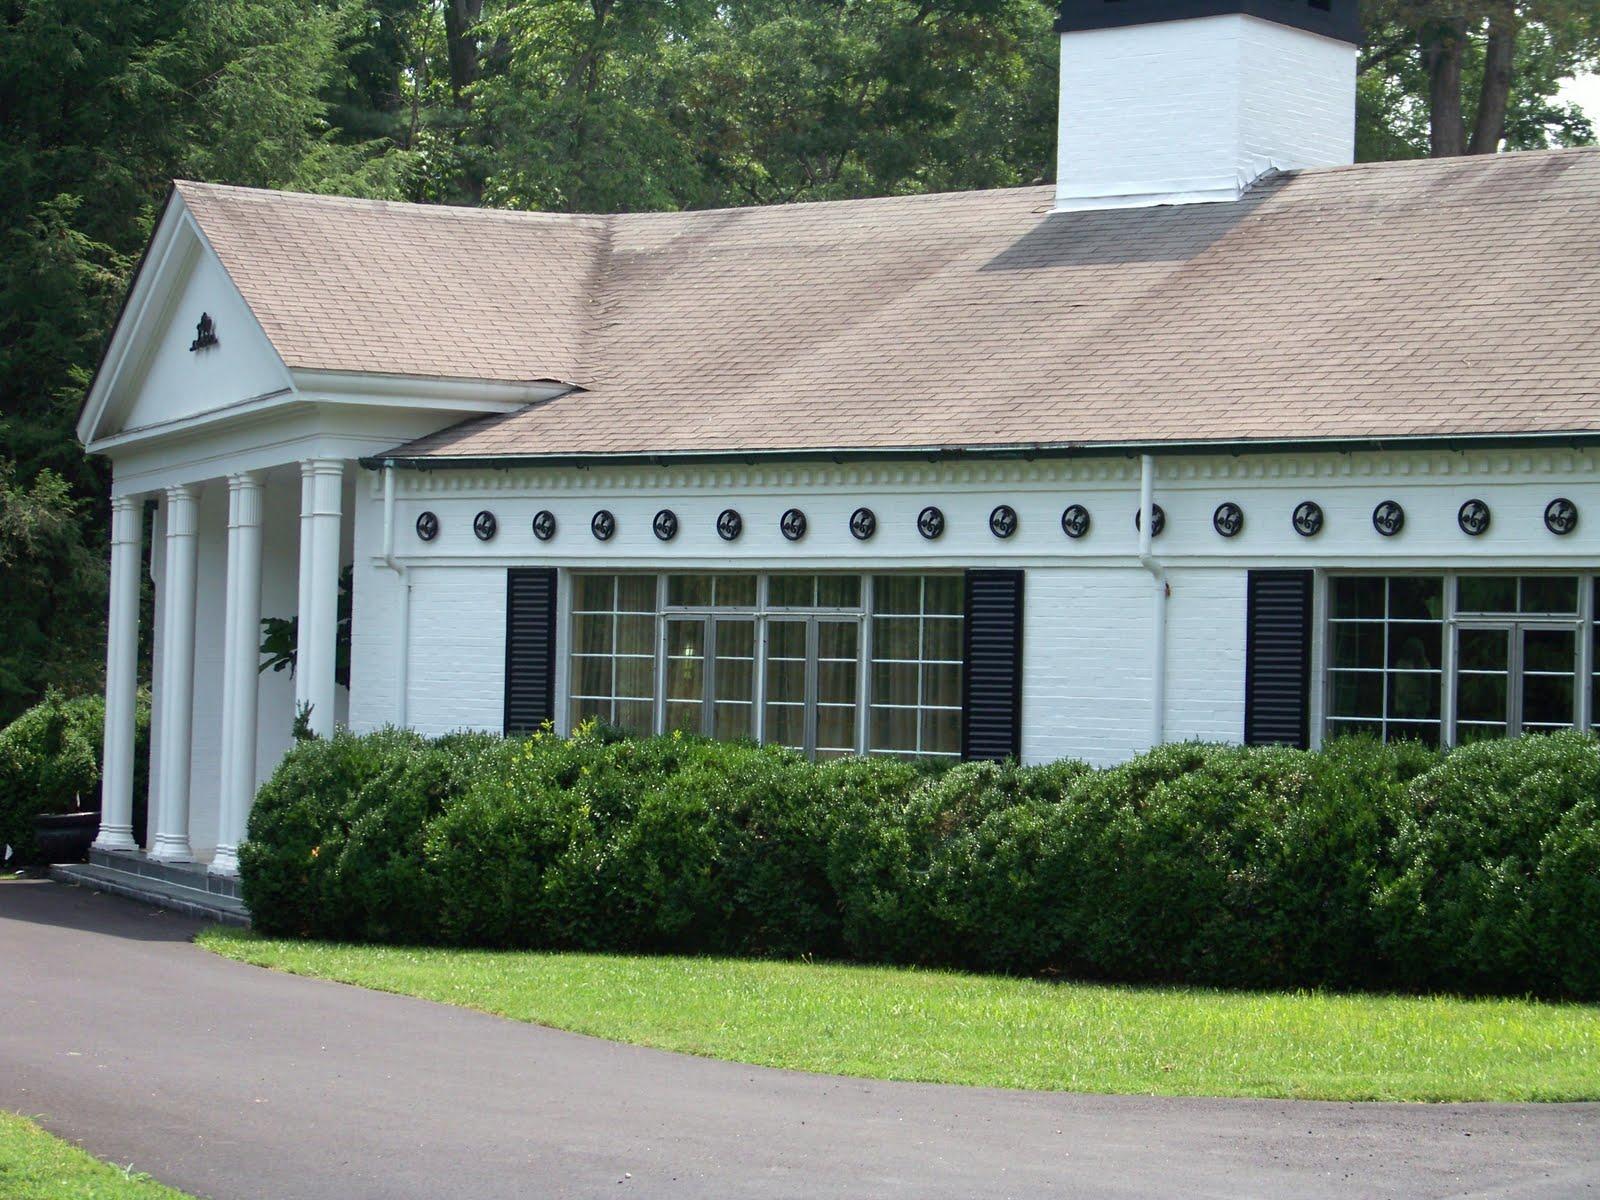 ginger monroe interior design ranch style homes front porch ranch style homes front porch planters